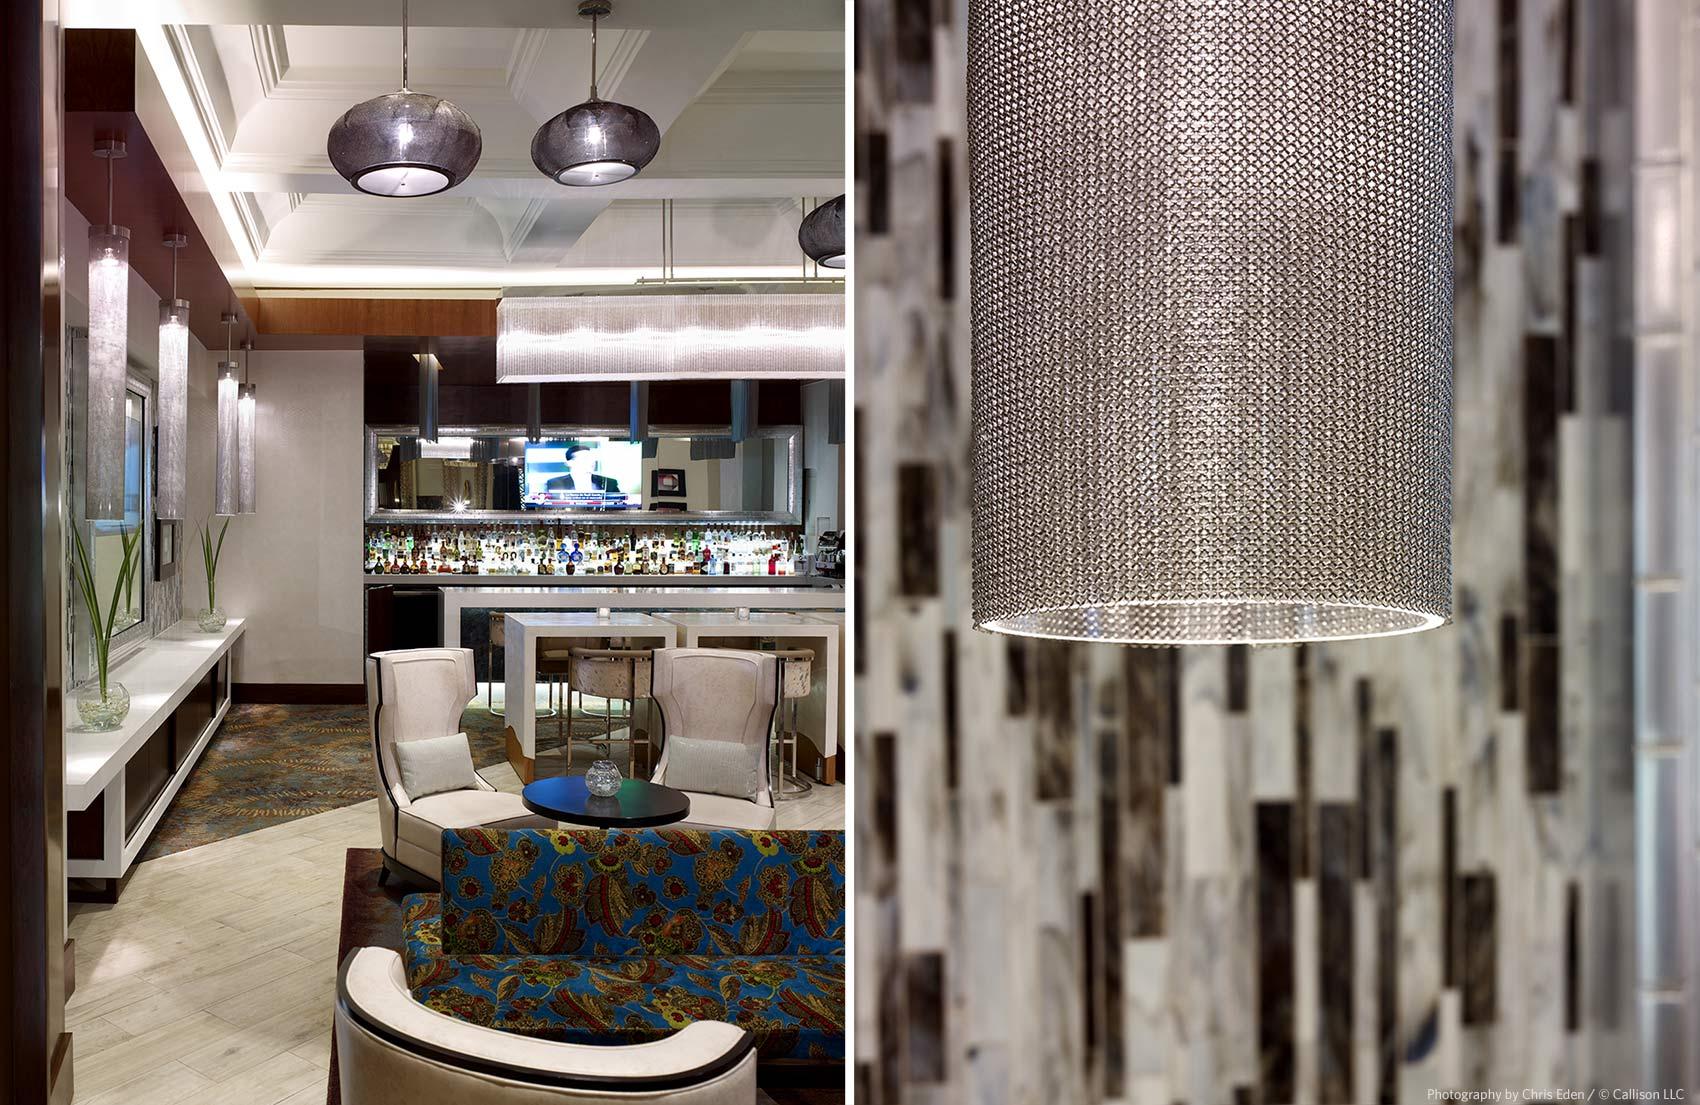 JW Marriott, Mexico City - Bar design elements